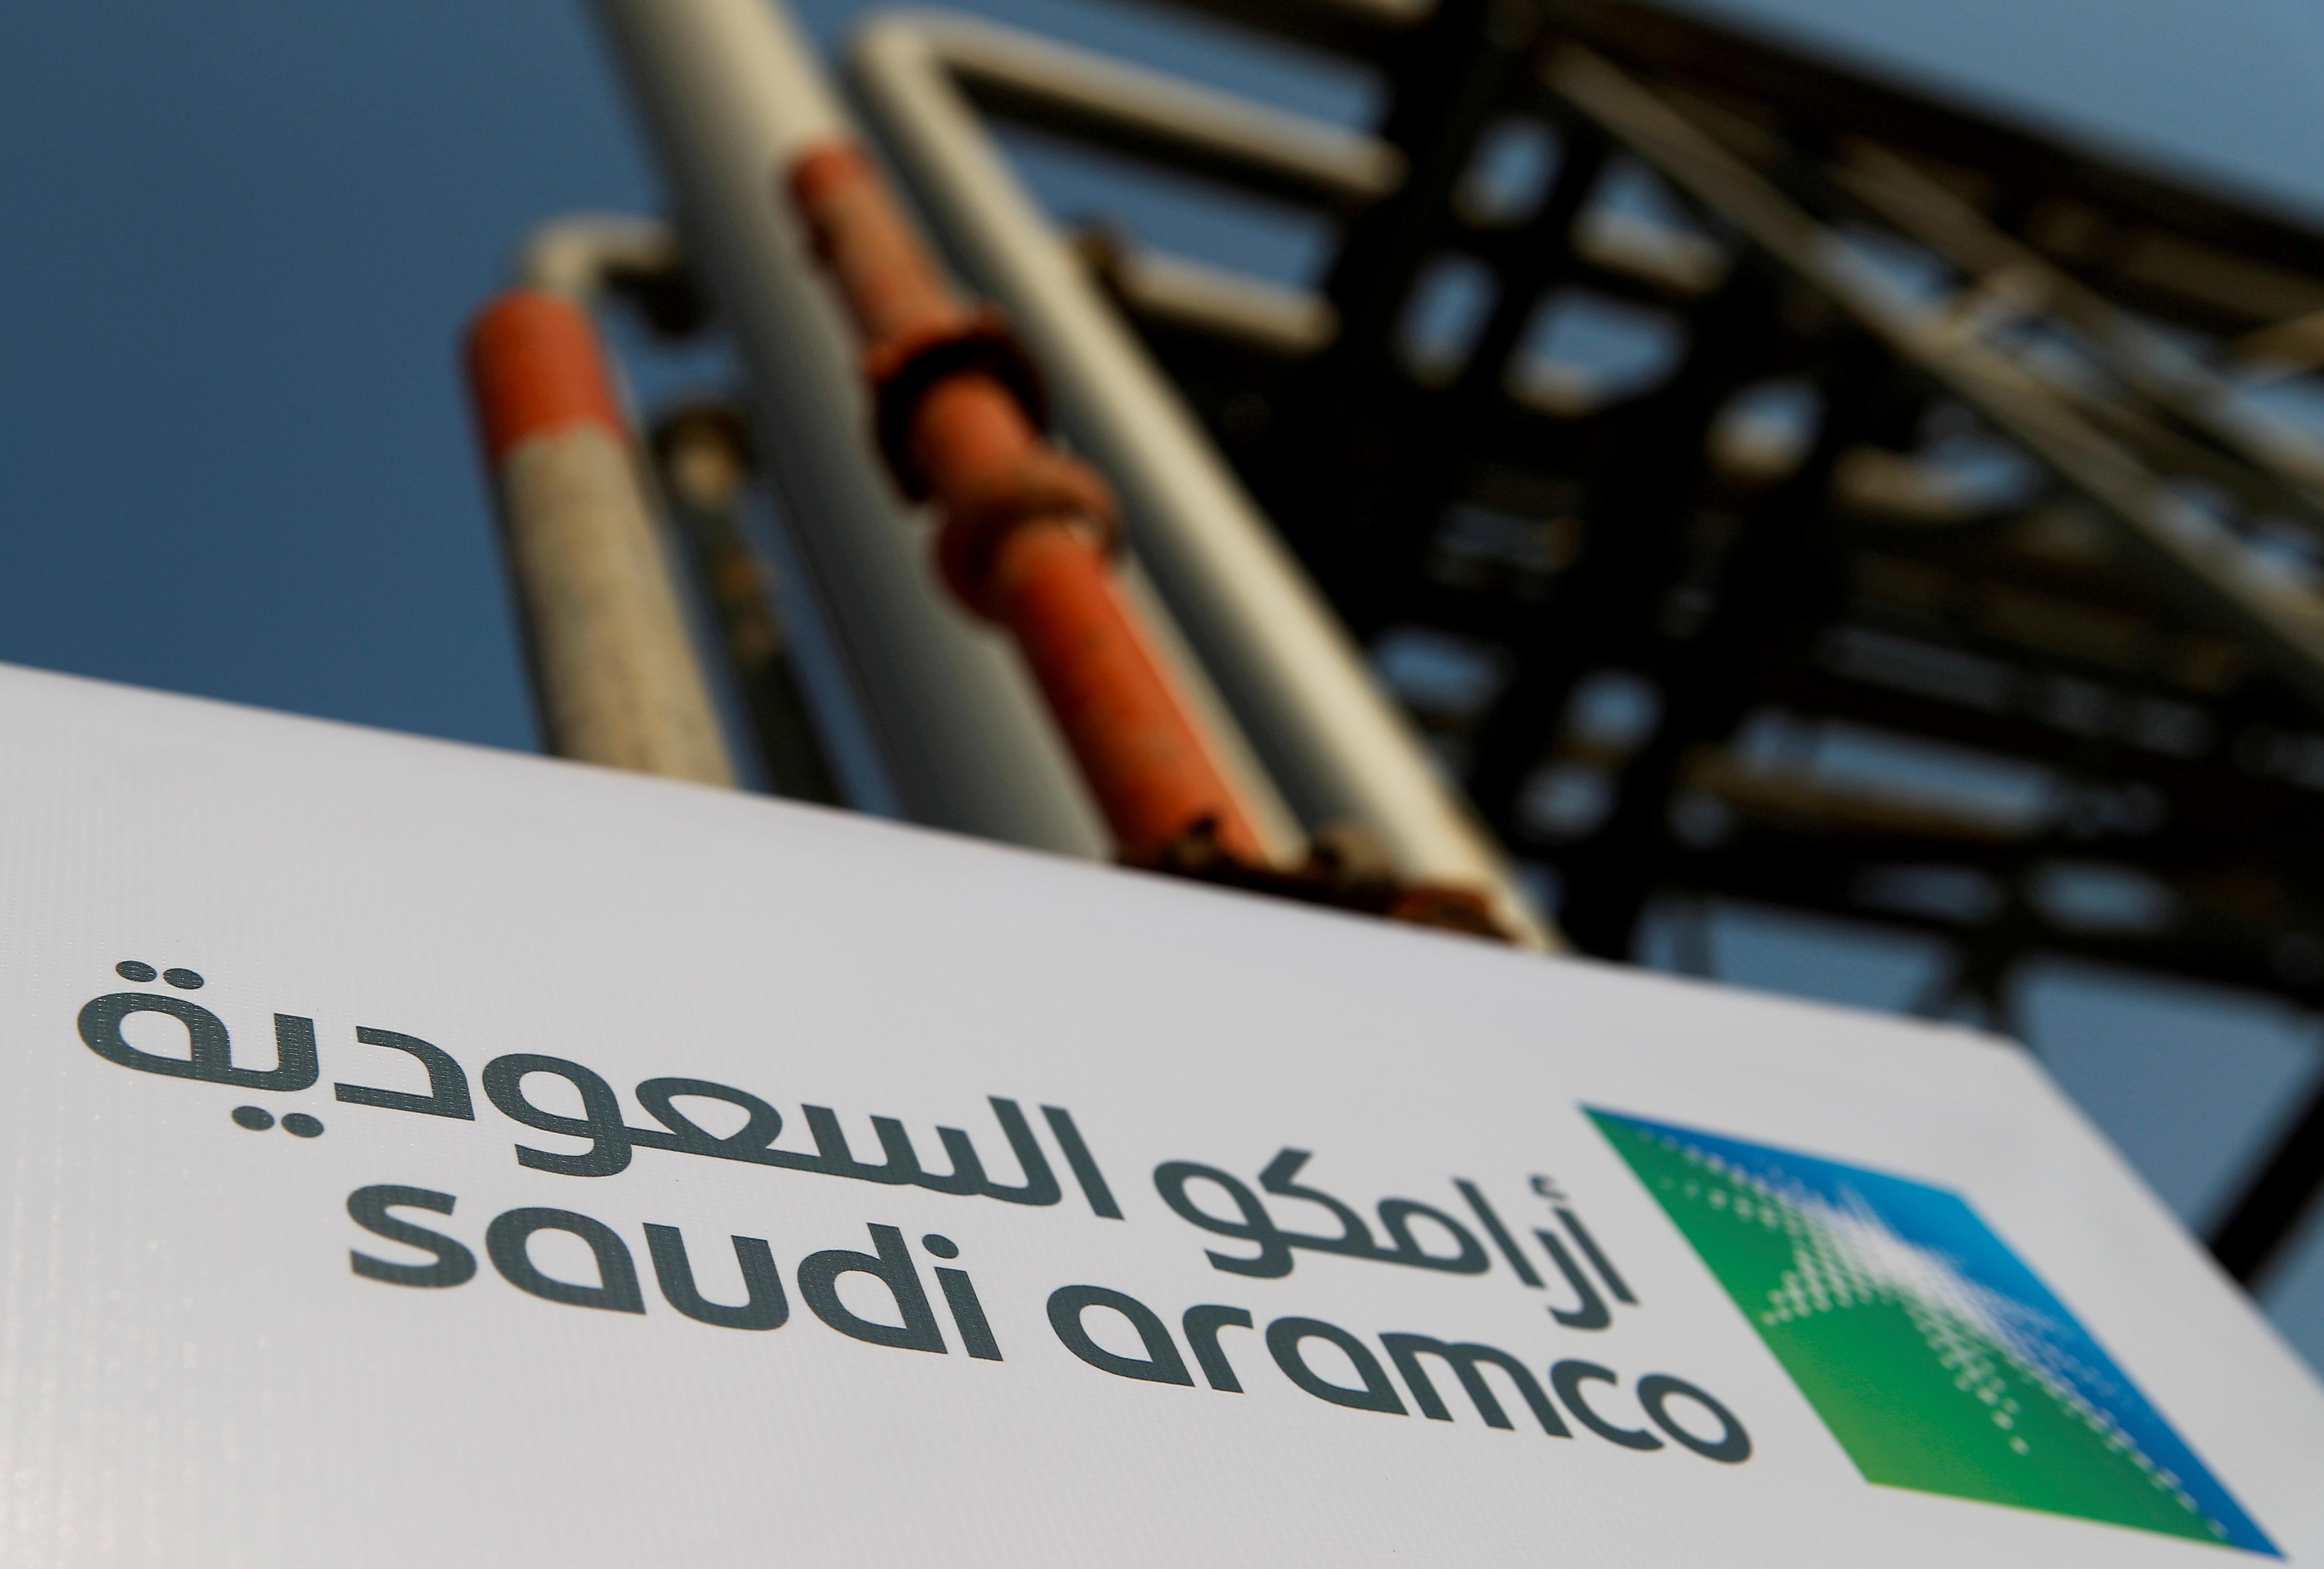 Saudi Aramco logo is pictured at the oil facility in Abqaiq, Saudi Arabia October 12, 2019. REUTERS/Maxim Shemetov/File Photo